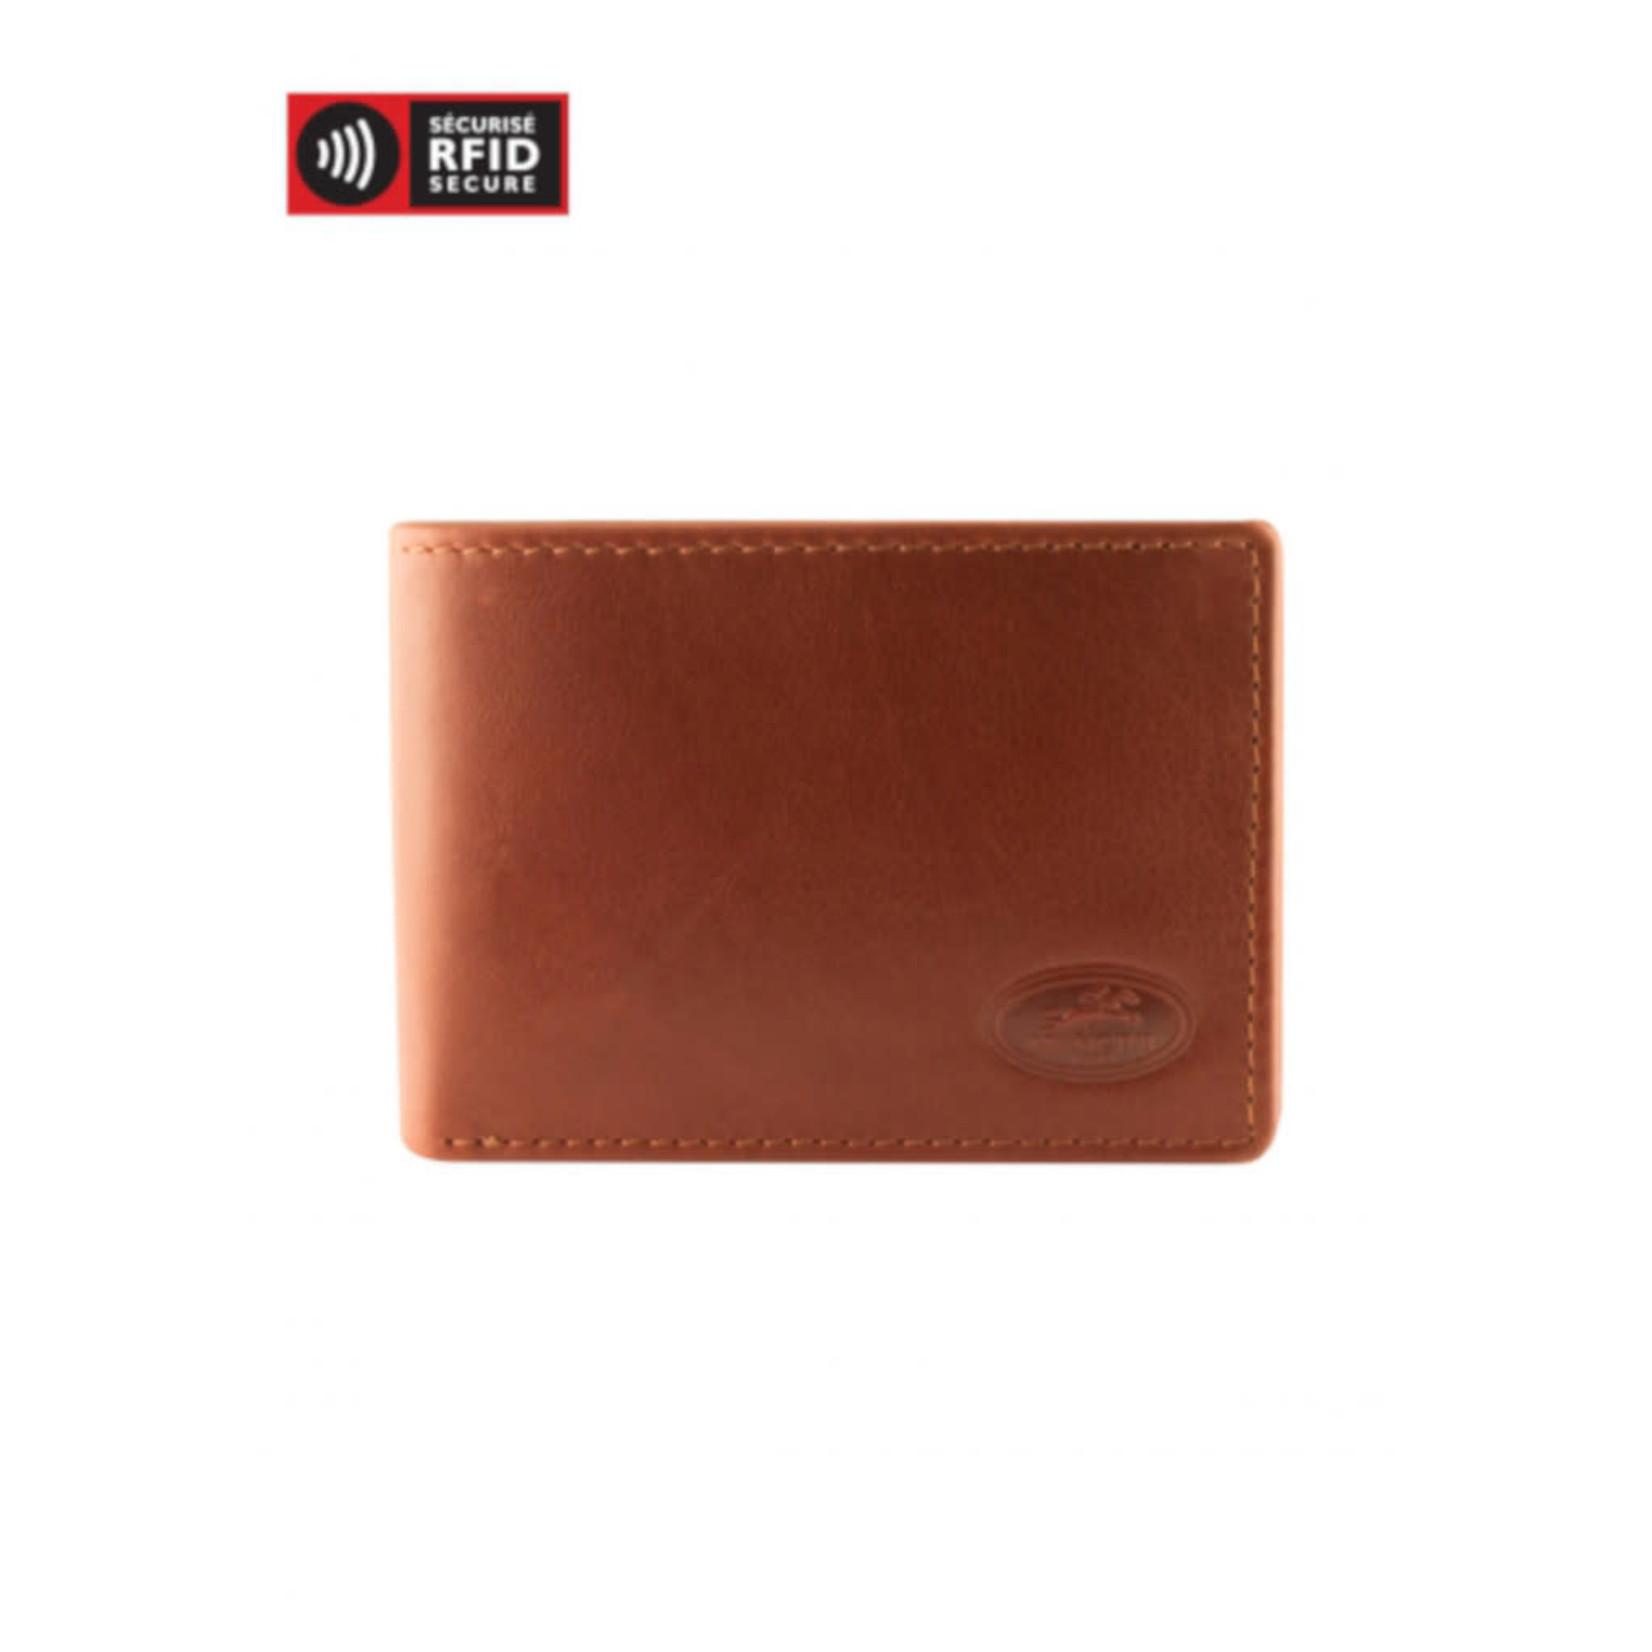 Mancini Mancini 2010105 RFID Slimfold